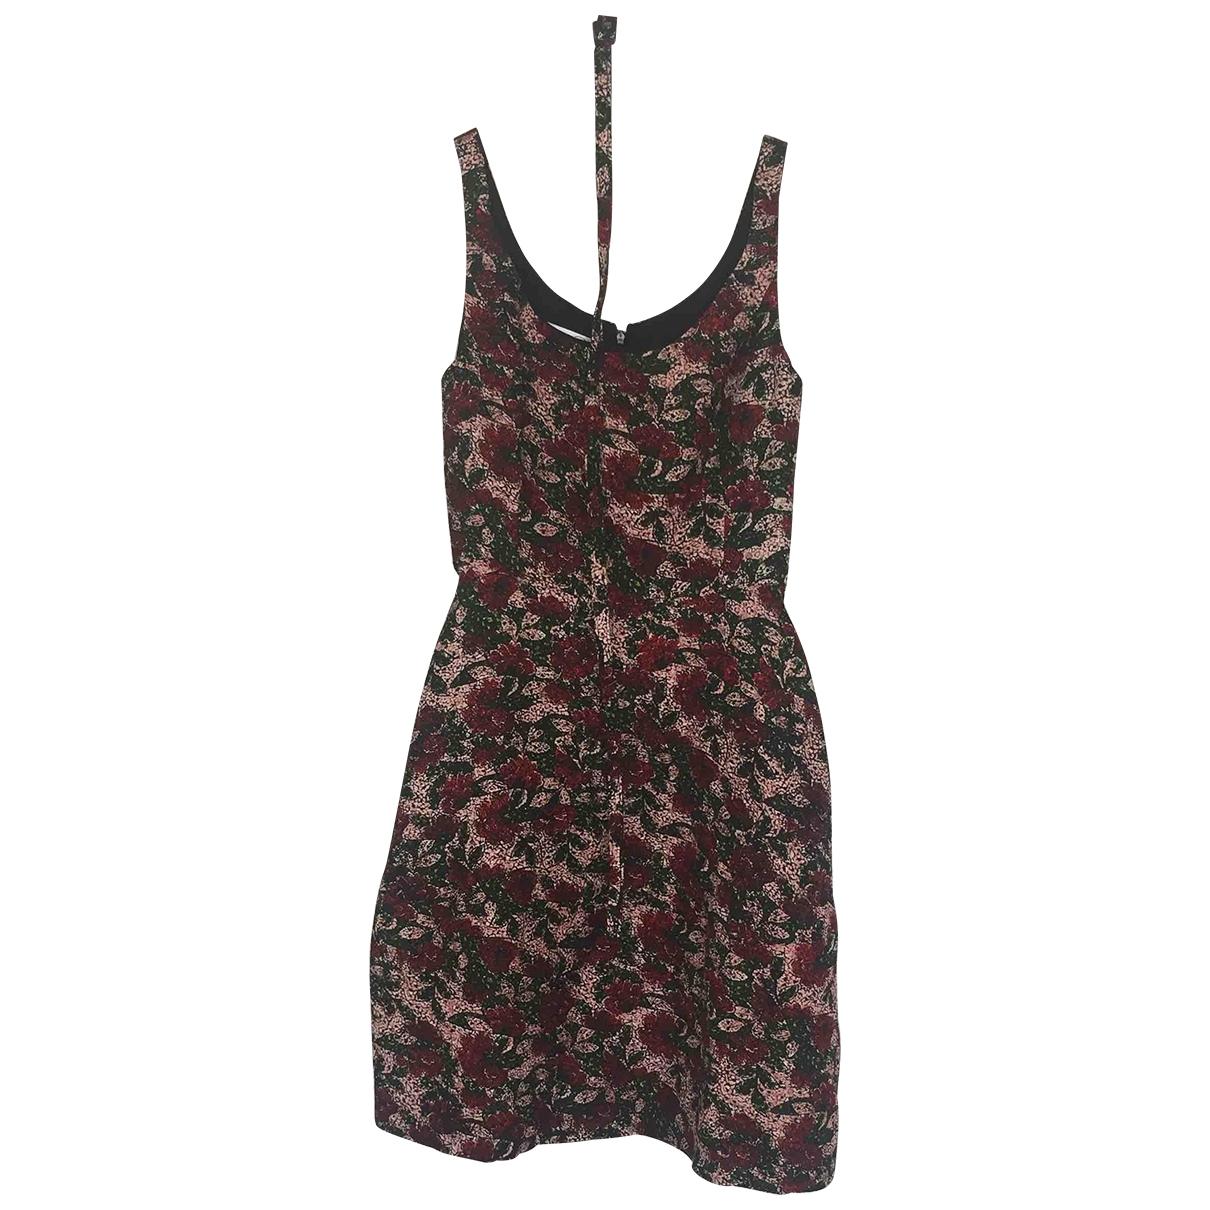 Oscar De La Renta \N Burgundy Silk dress for Women 6 US